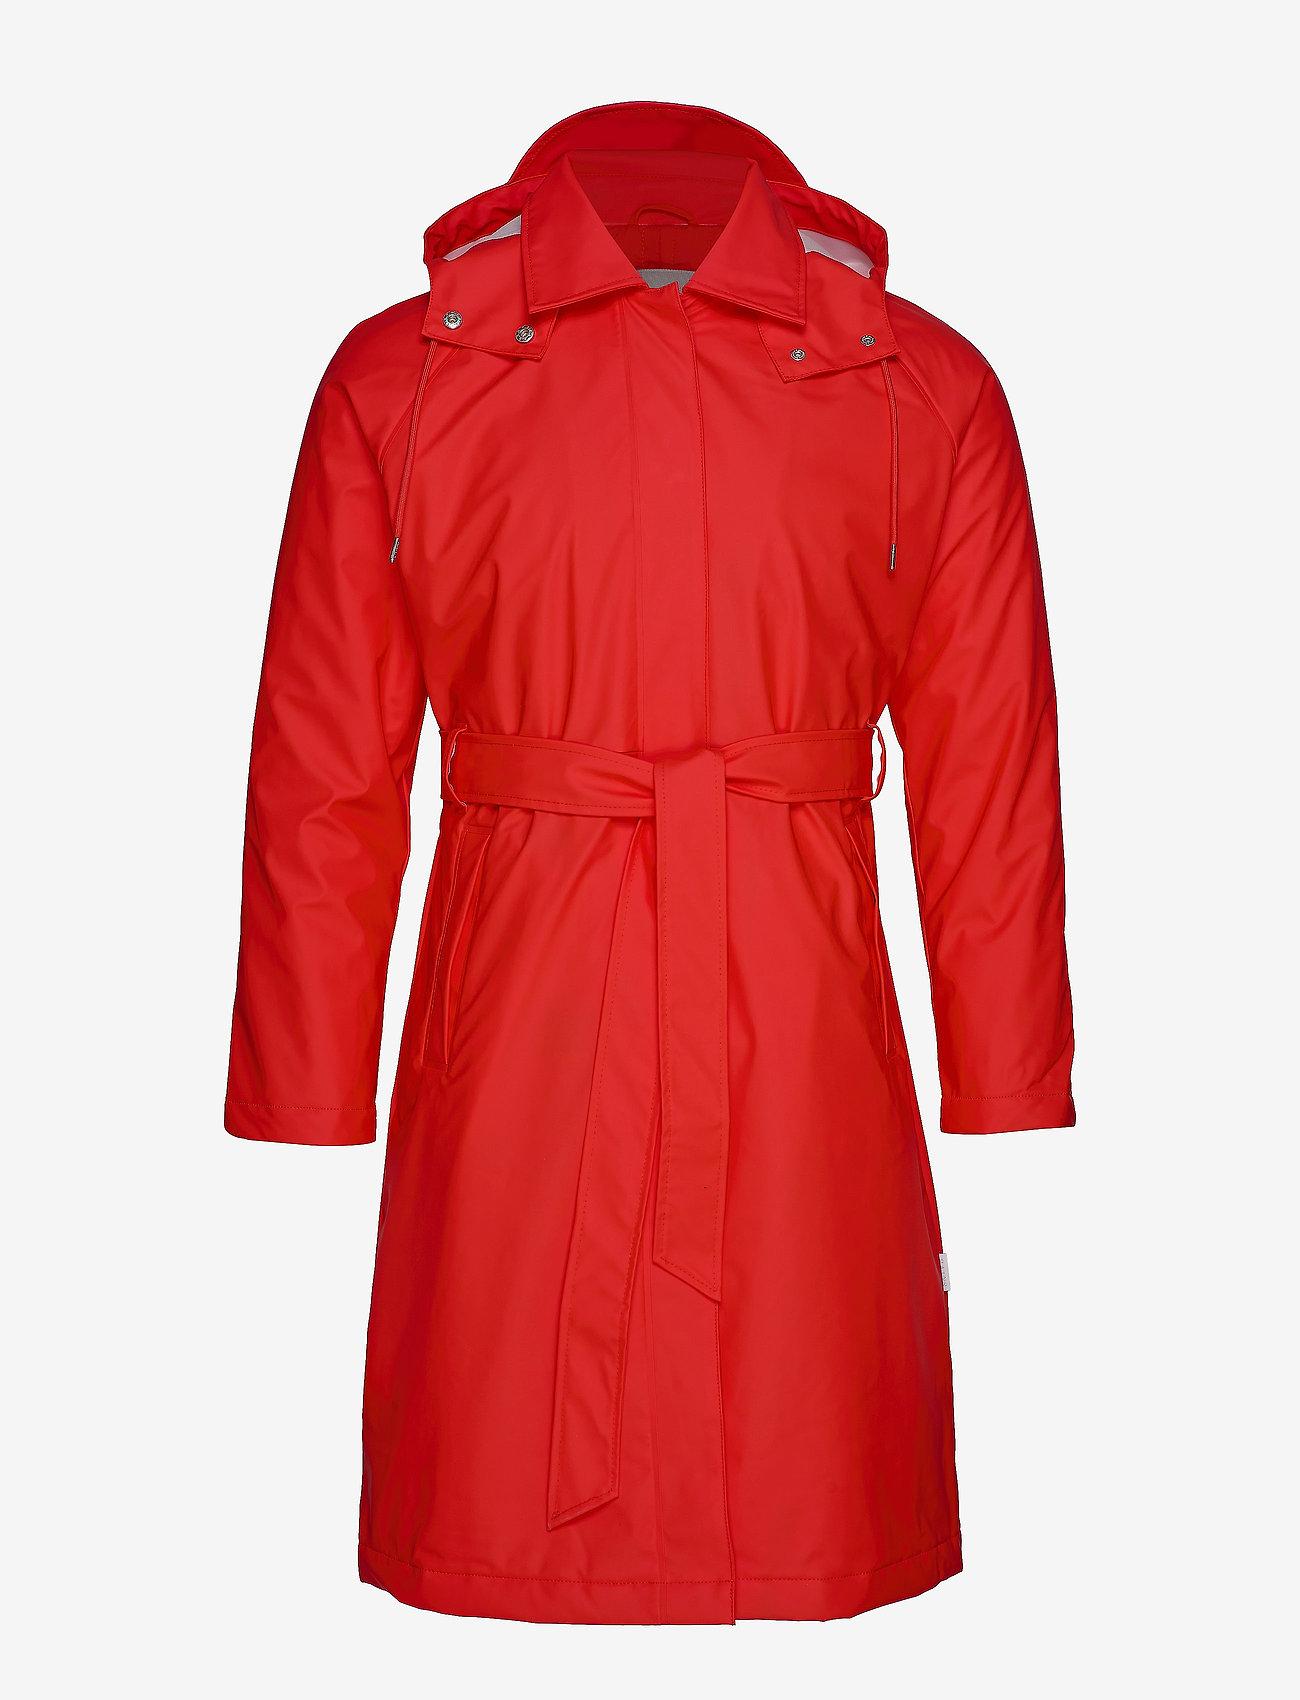 Rains - W Trench Coat - regenbekleidung - red - 1